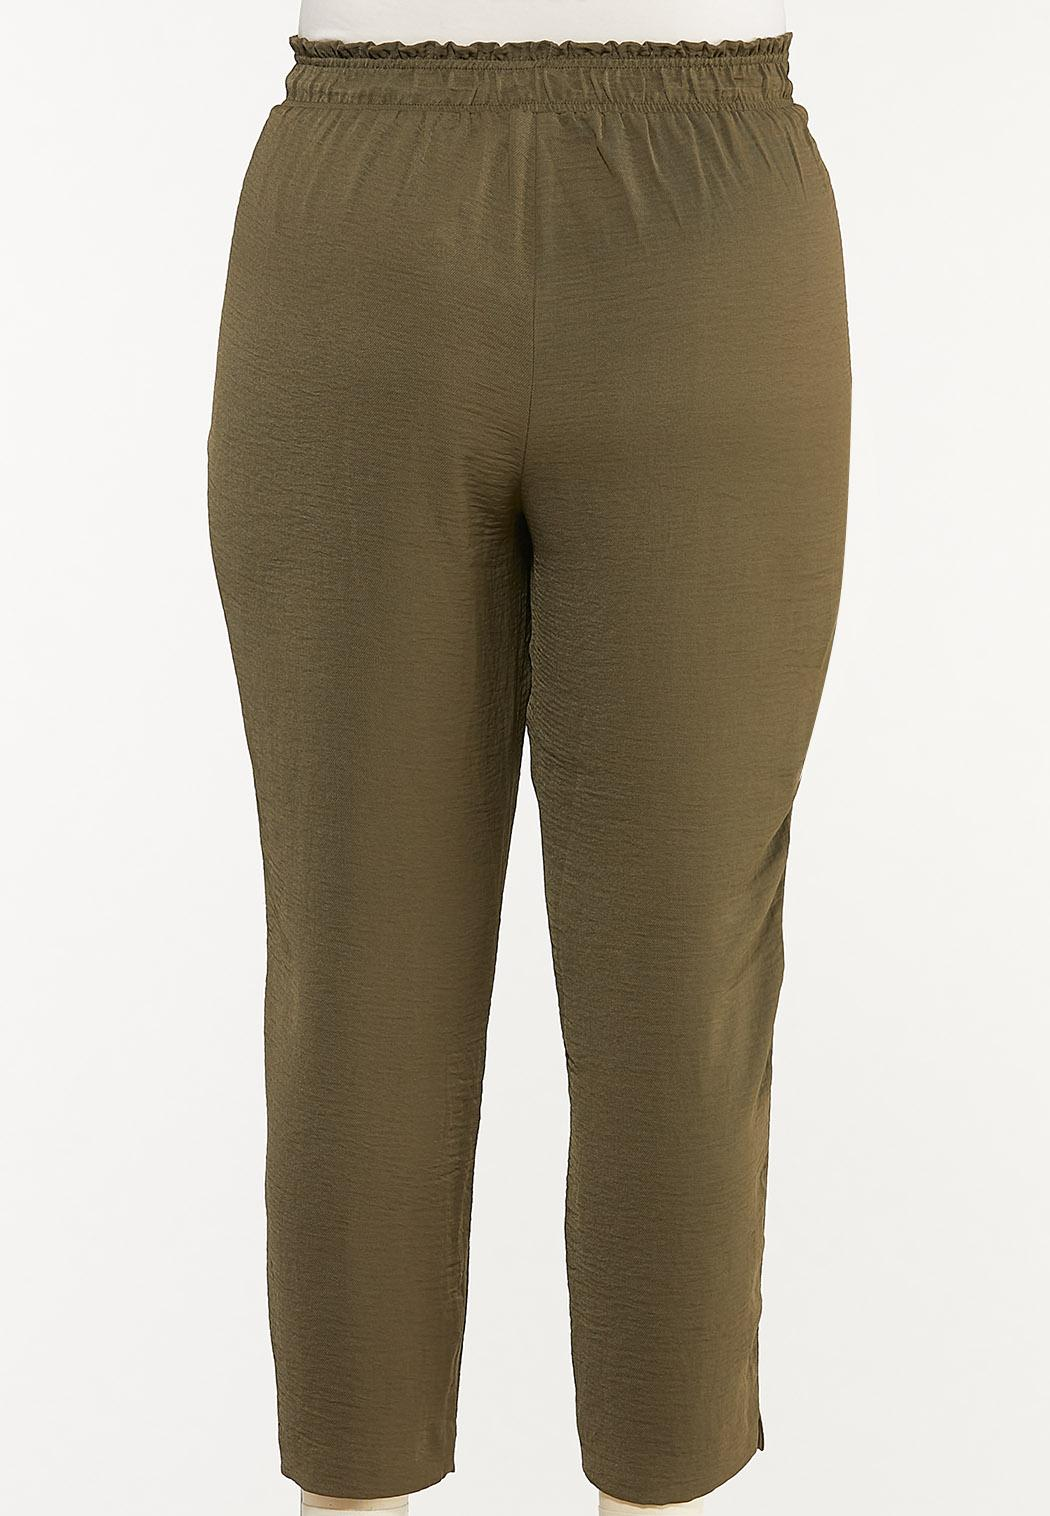 Plus Size Olive Track Pants (Item #44588666)